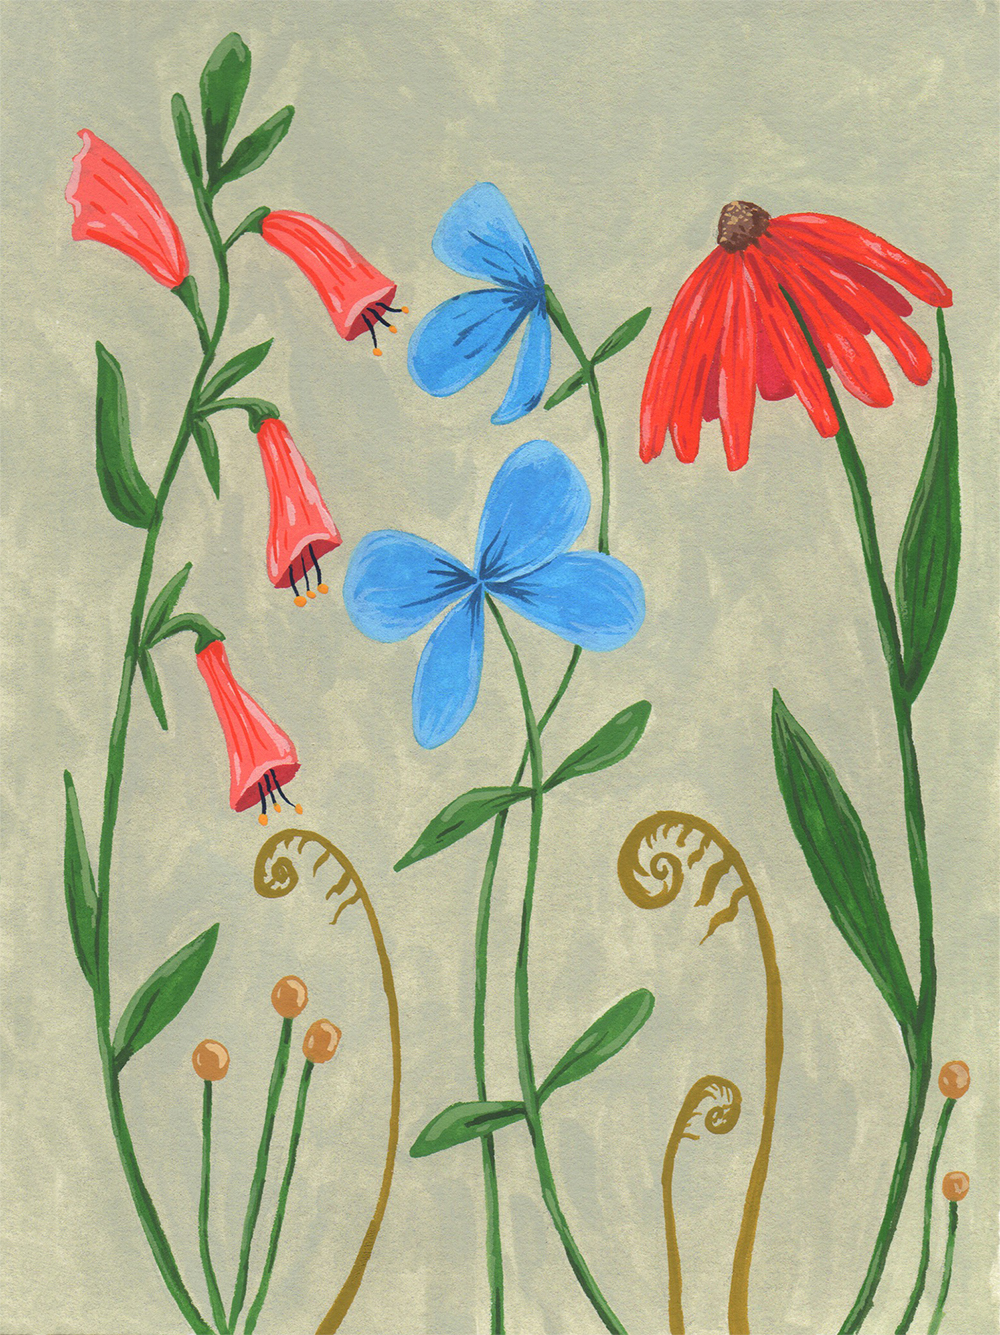 floralscene_5x7.jpg